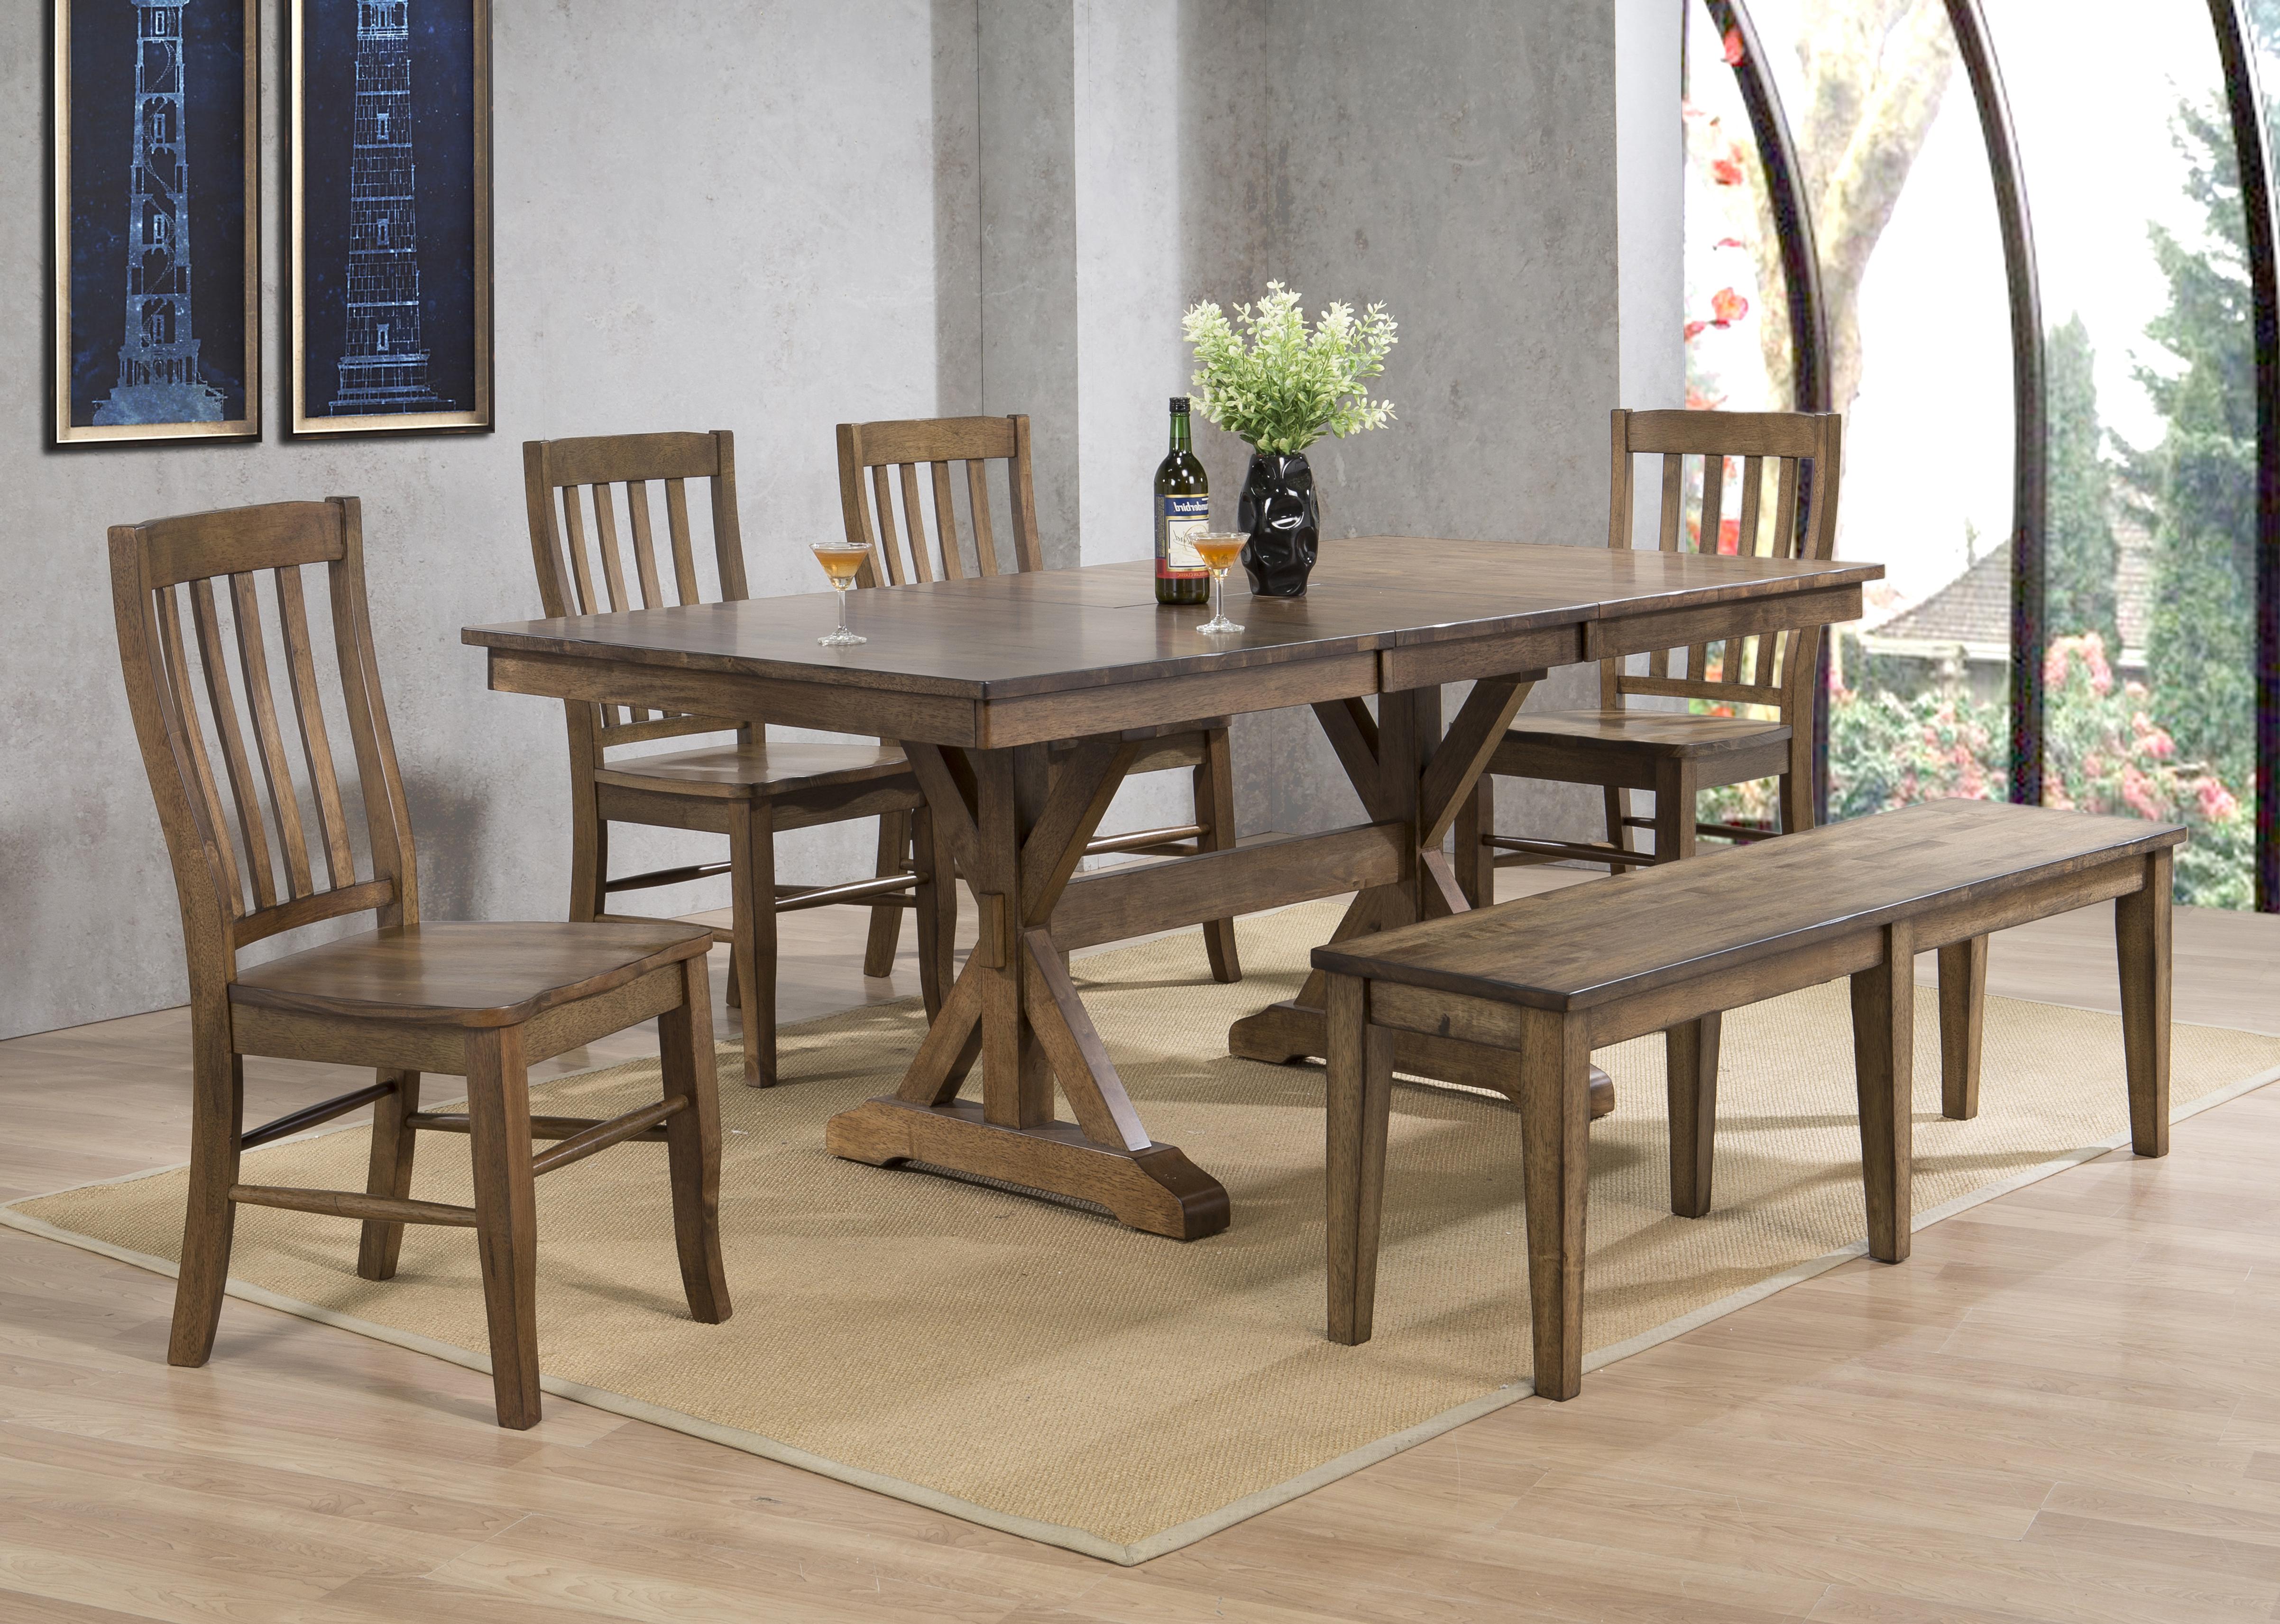 Dining Sets Sofas Chairs Desks Beds Mattresses Furniture Decor